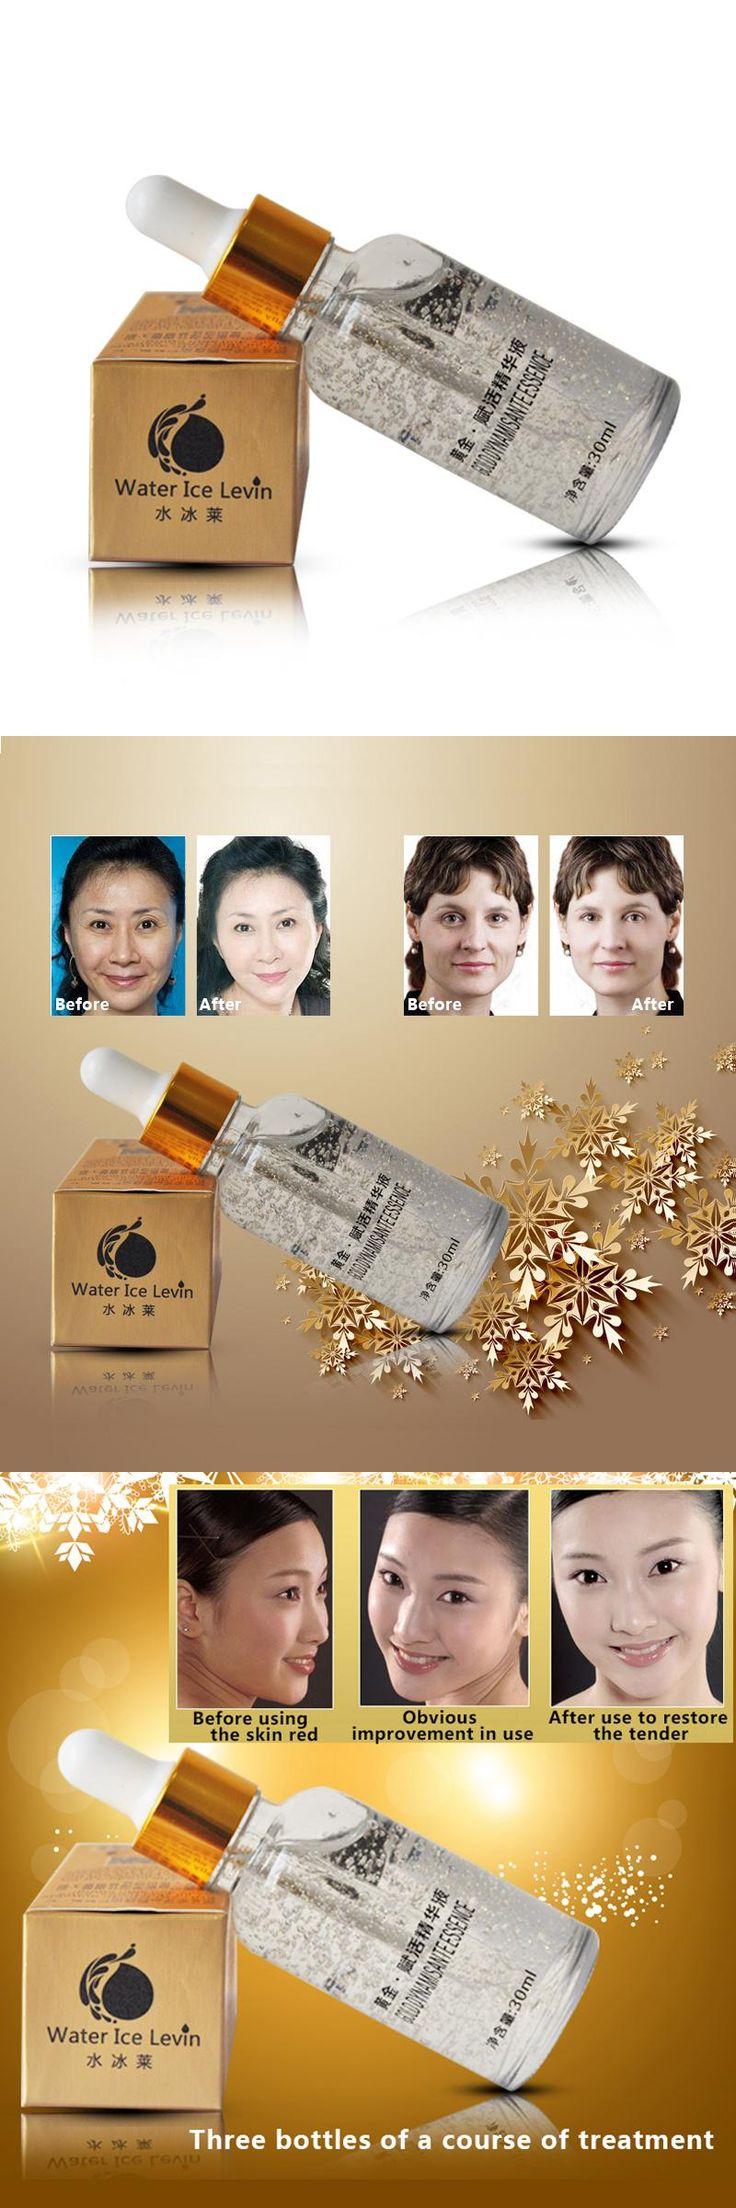 [Visit to Buy] 30ml 24k Pure Gold Foil Essence Moisturizing Anti-Aging Remove Acne Anti-redness Hyaluronic Acid Whitening Face Cream Serum #Advertisement